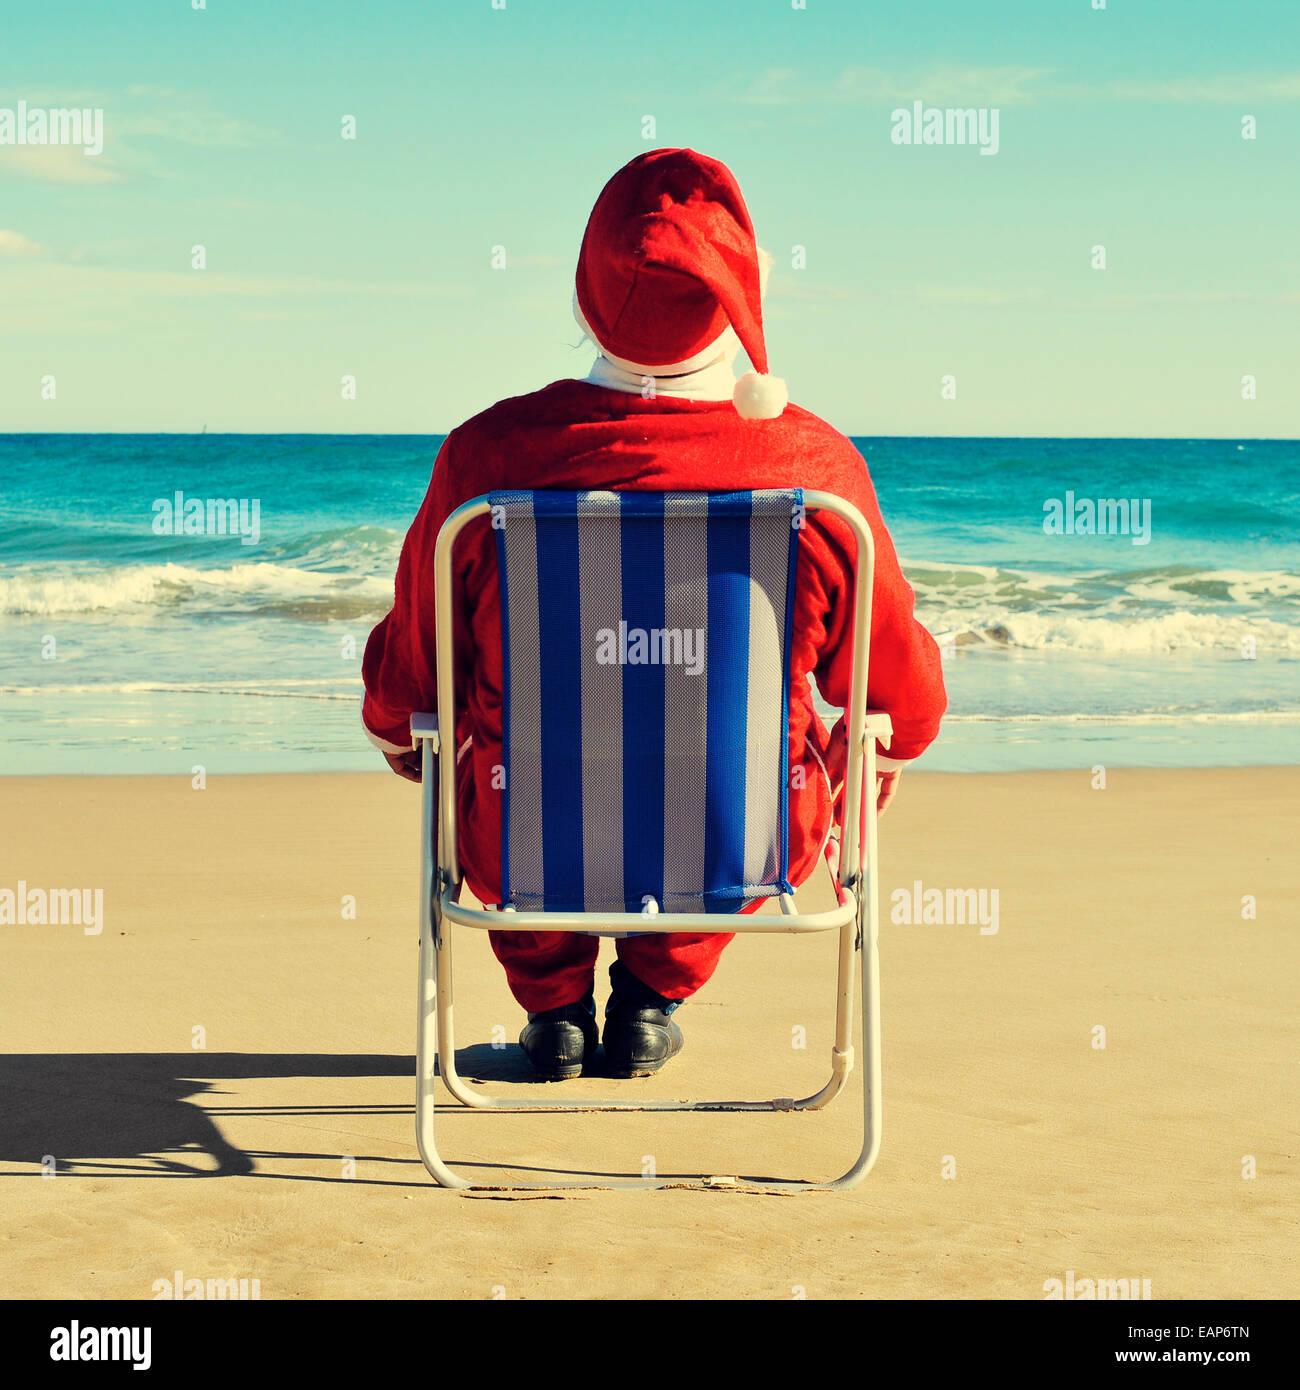 santa claus sitting in a beach chair on the beach - Stock Image